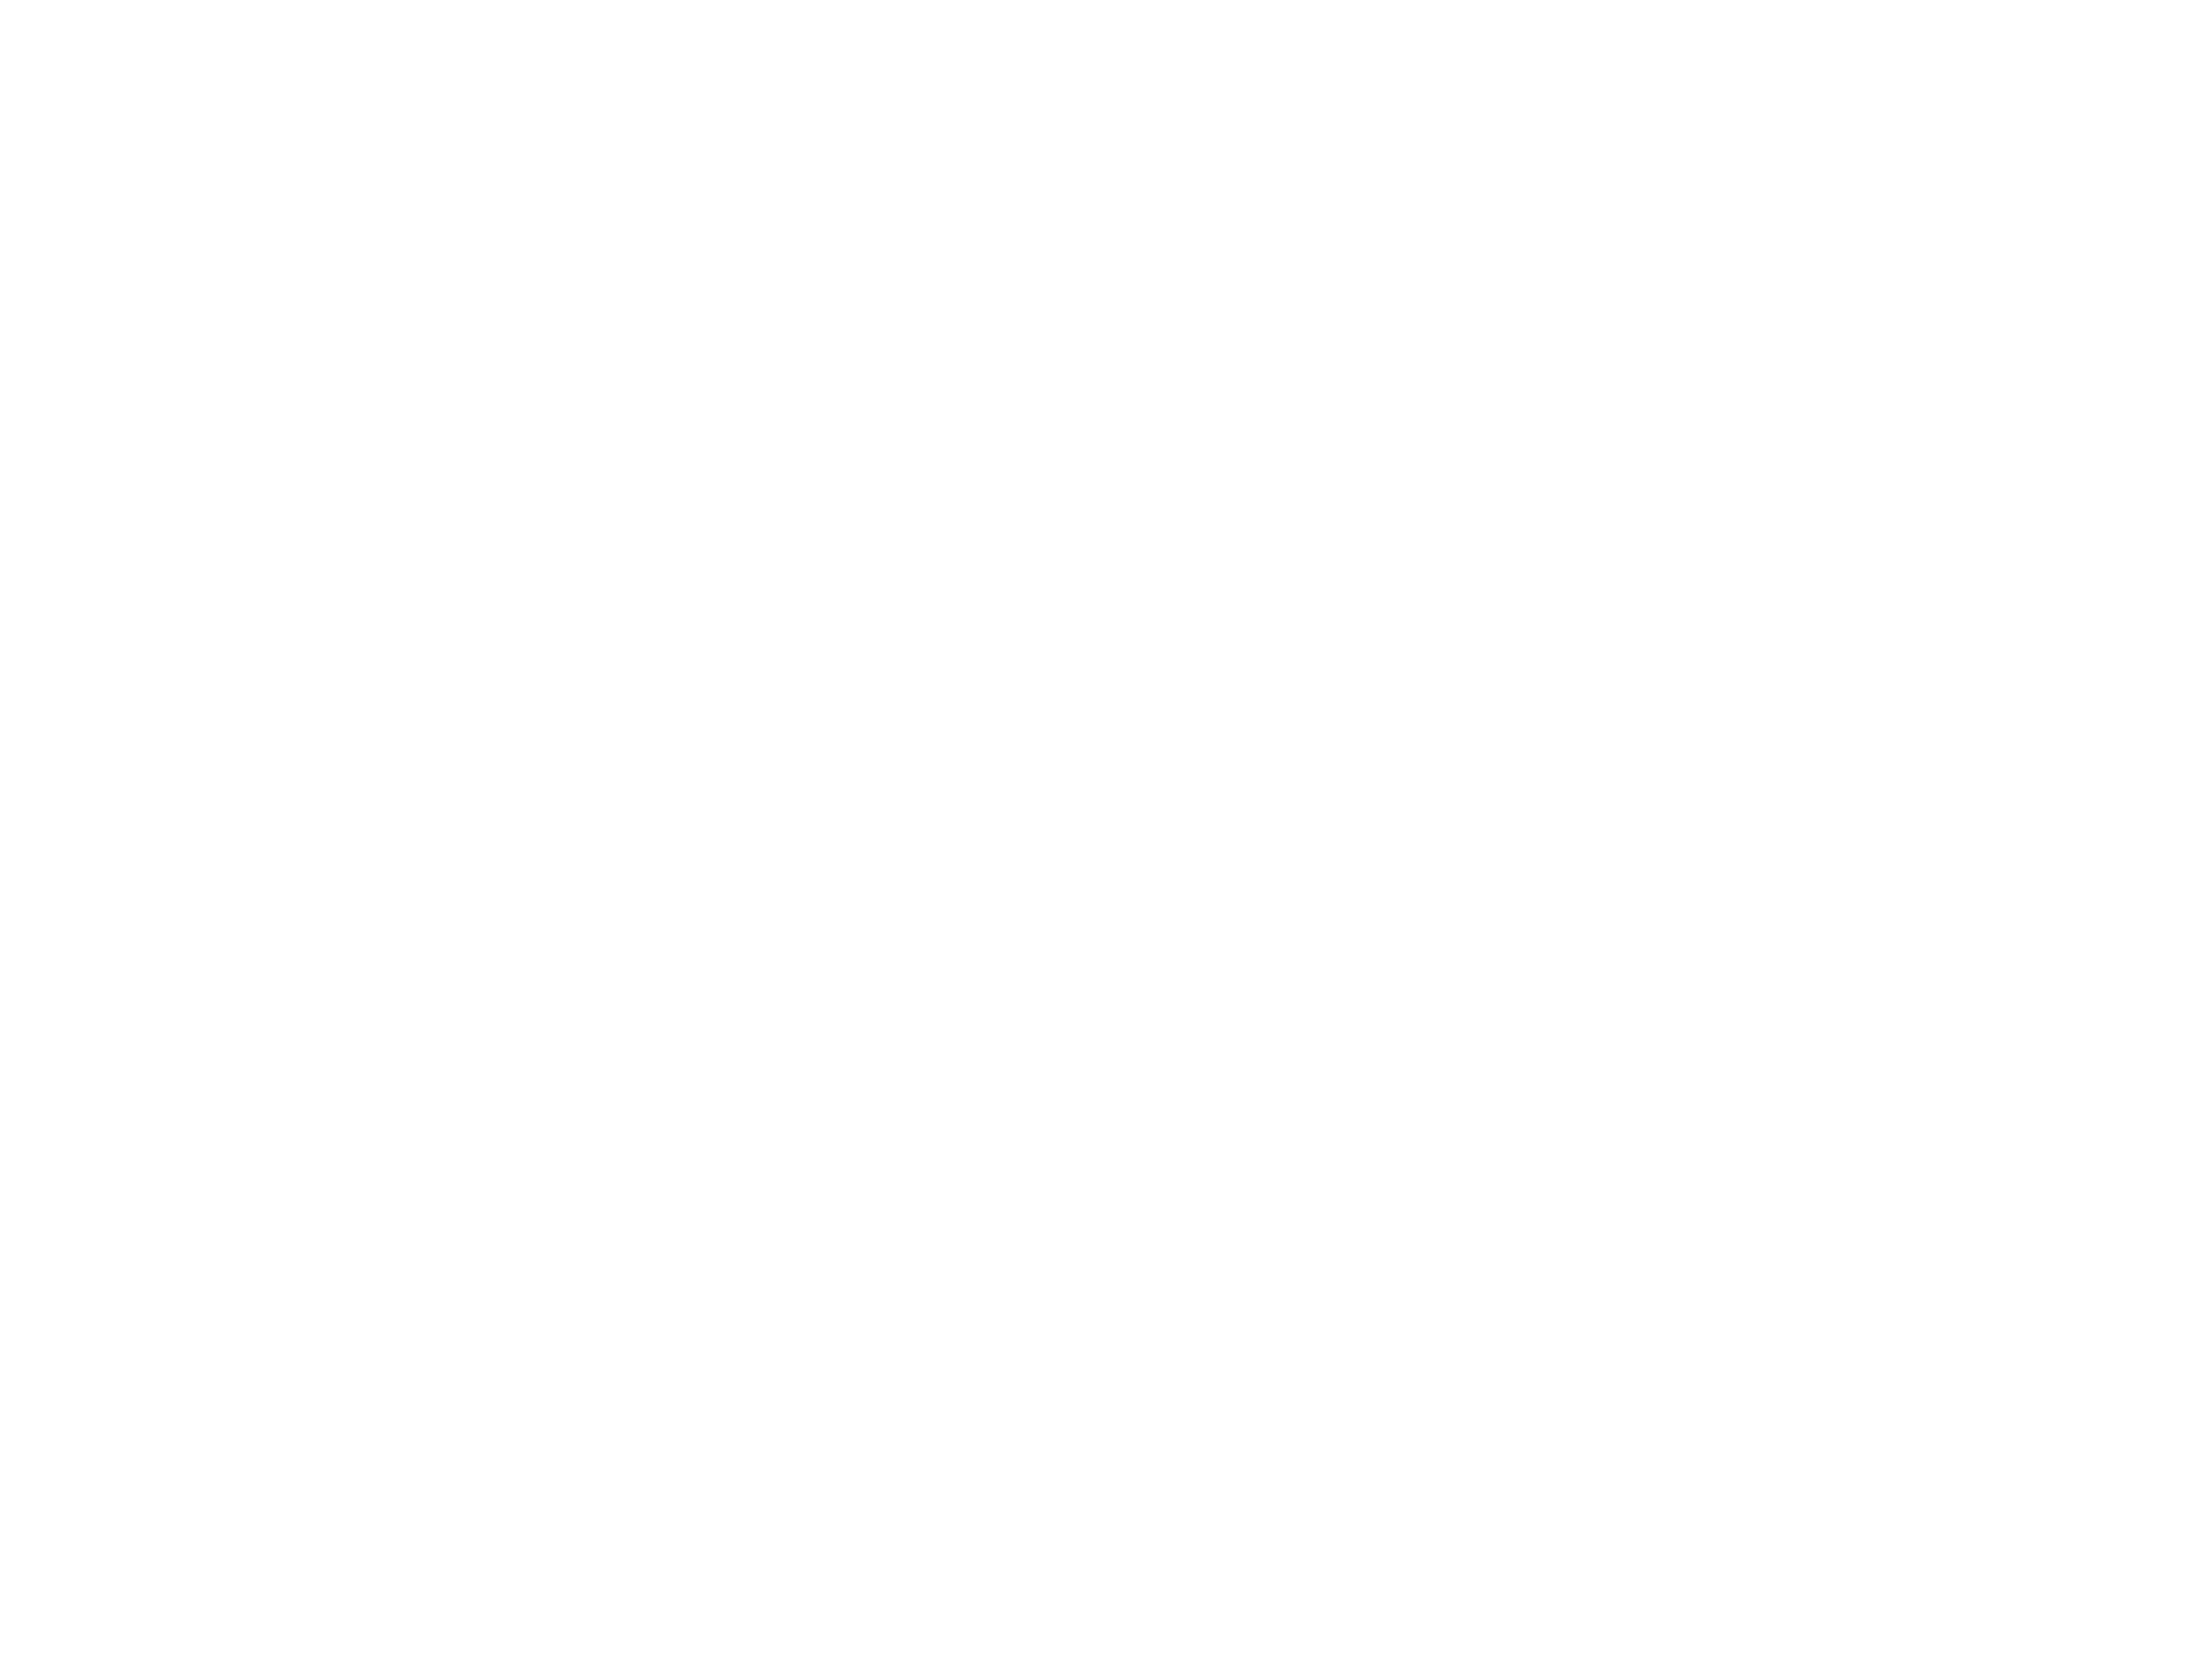 BARAUSSE 2014